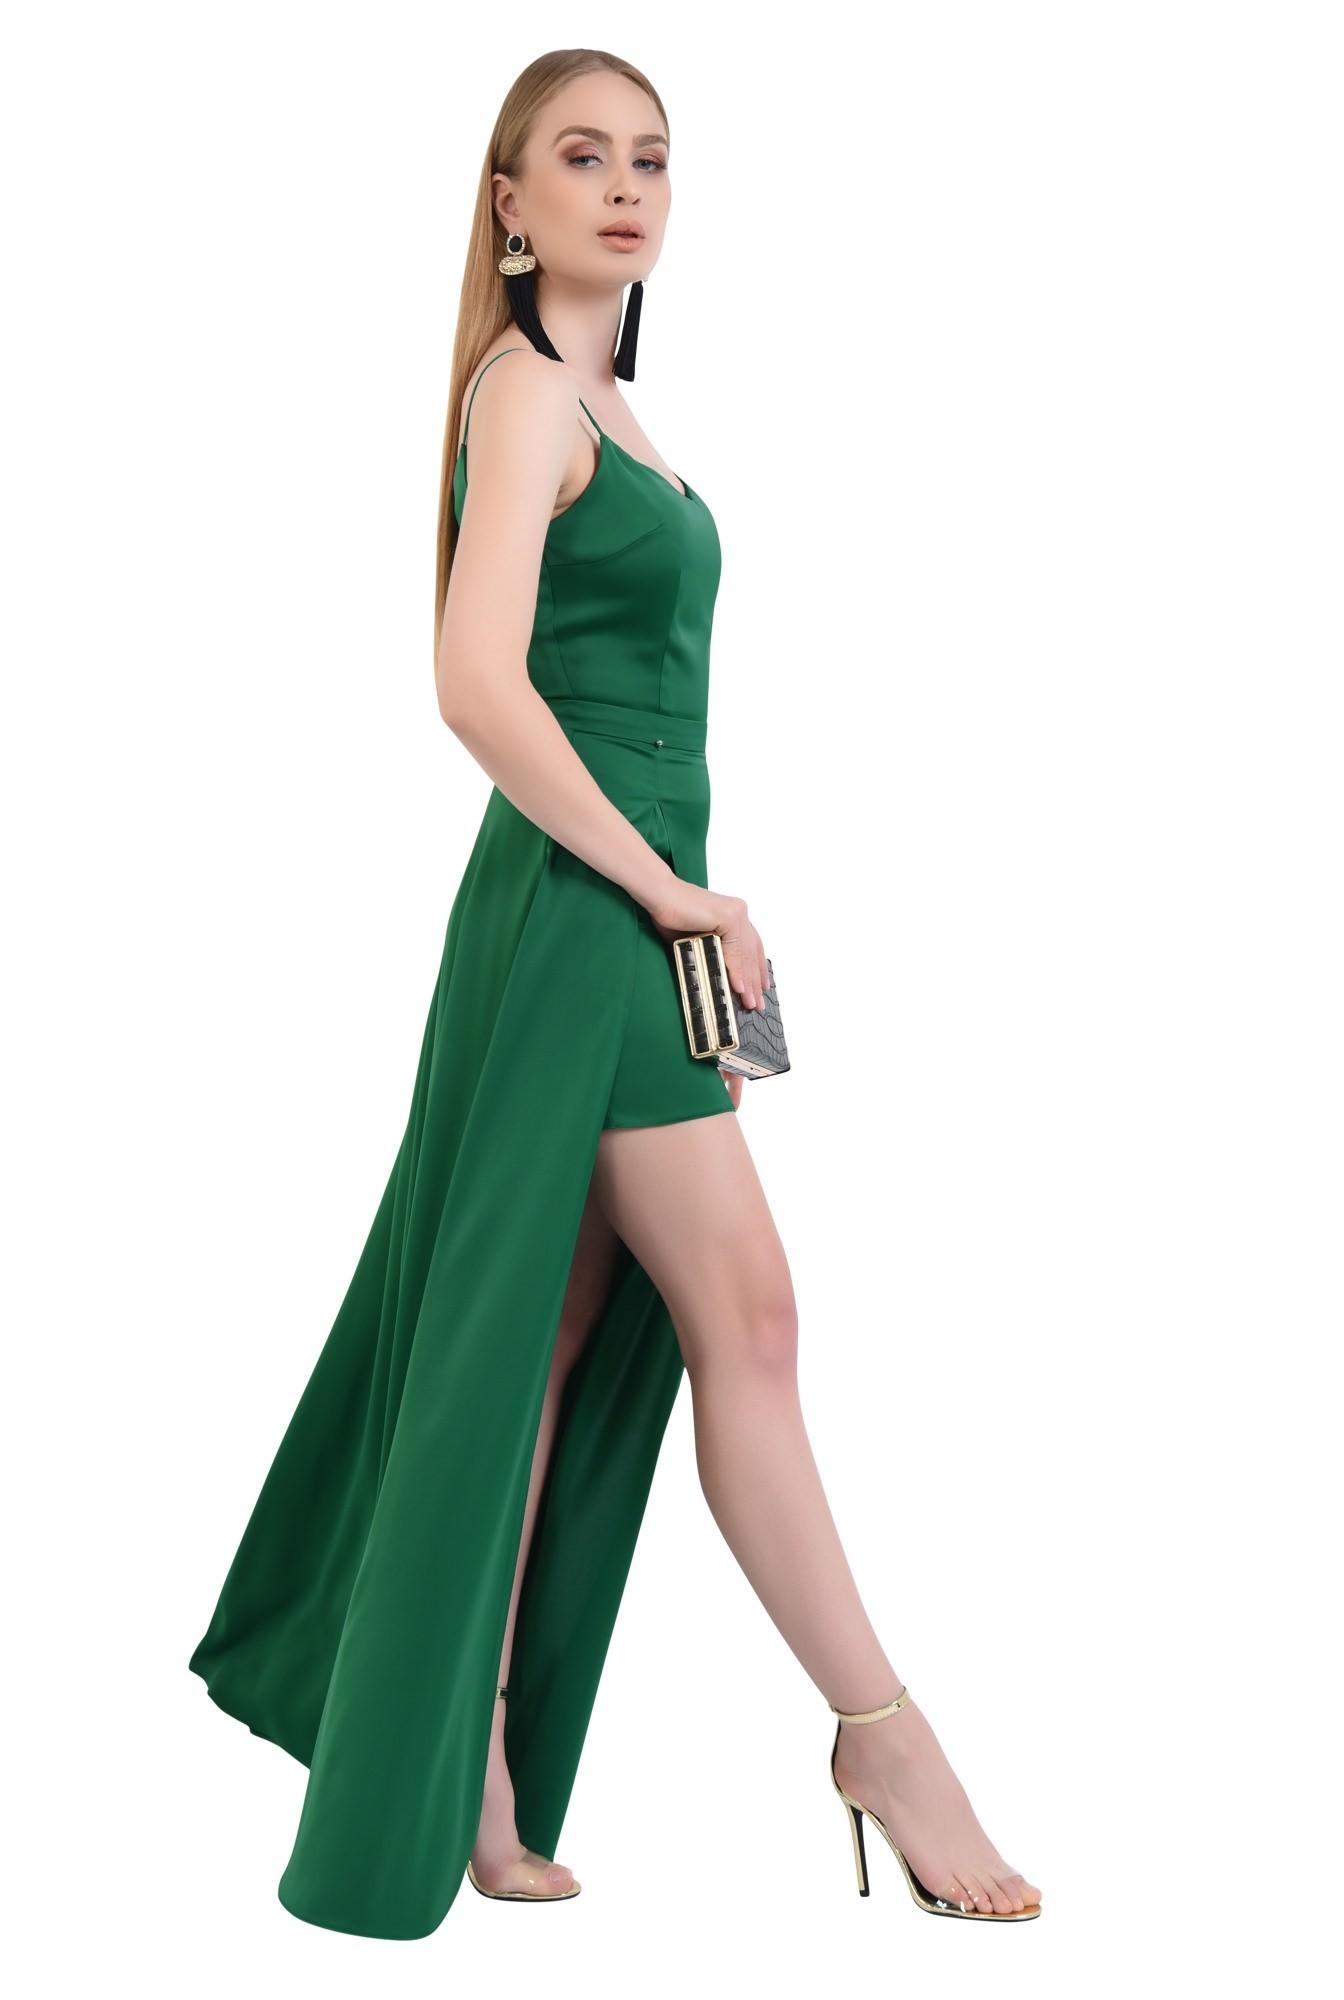 0 - rochie de seara, slit adanc, verde, smarald, bretele subtiri